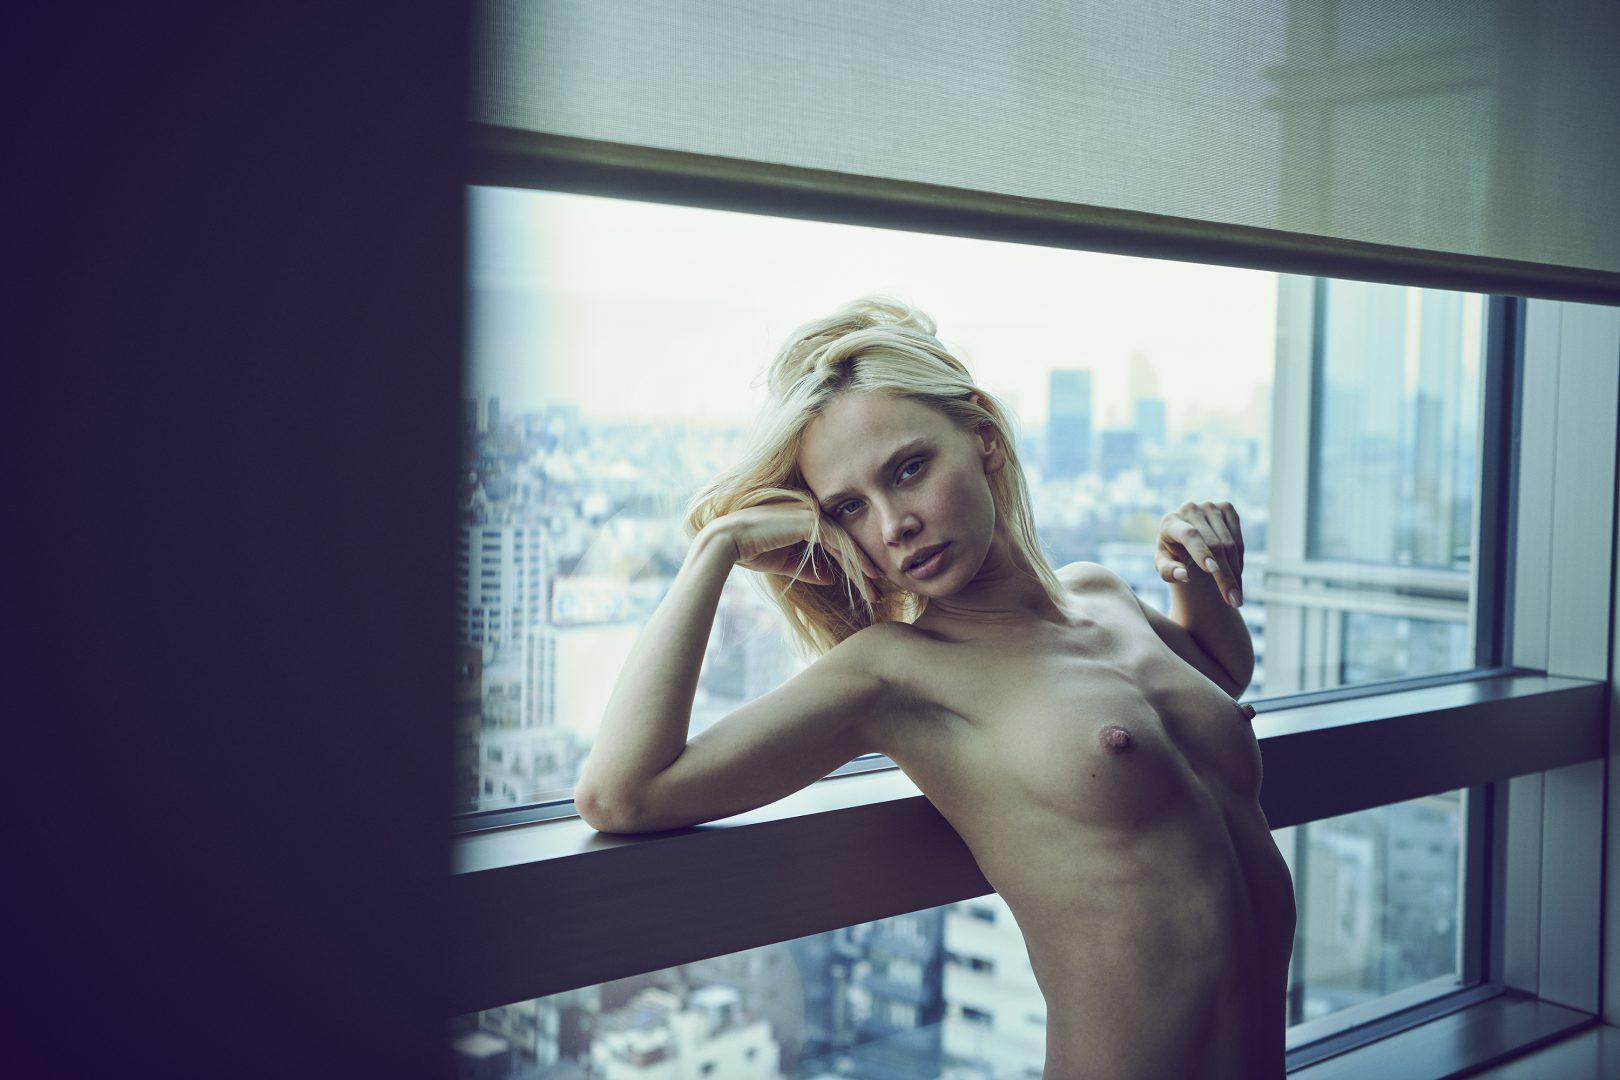 Naked girl in hotel room by stefan rappo